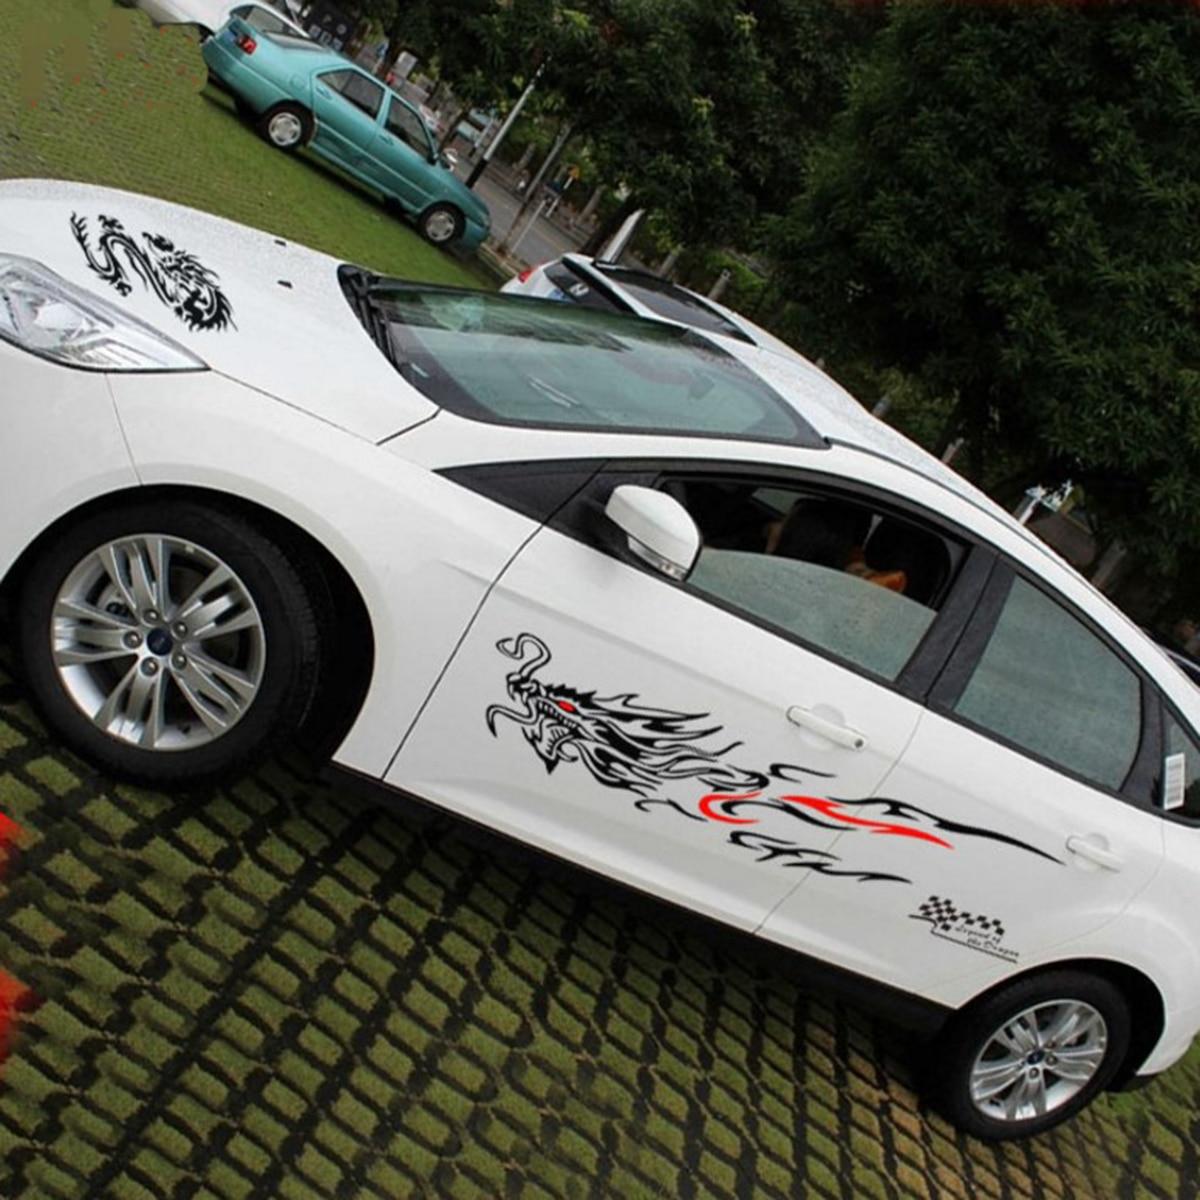 Car body sticker design singapore - Chinese Totem Dragon Graphics Side Decal Body Hood Car Stickers For Chevrolet Hyundai Vw Subaru Volvo